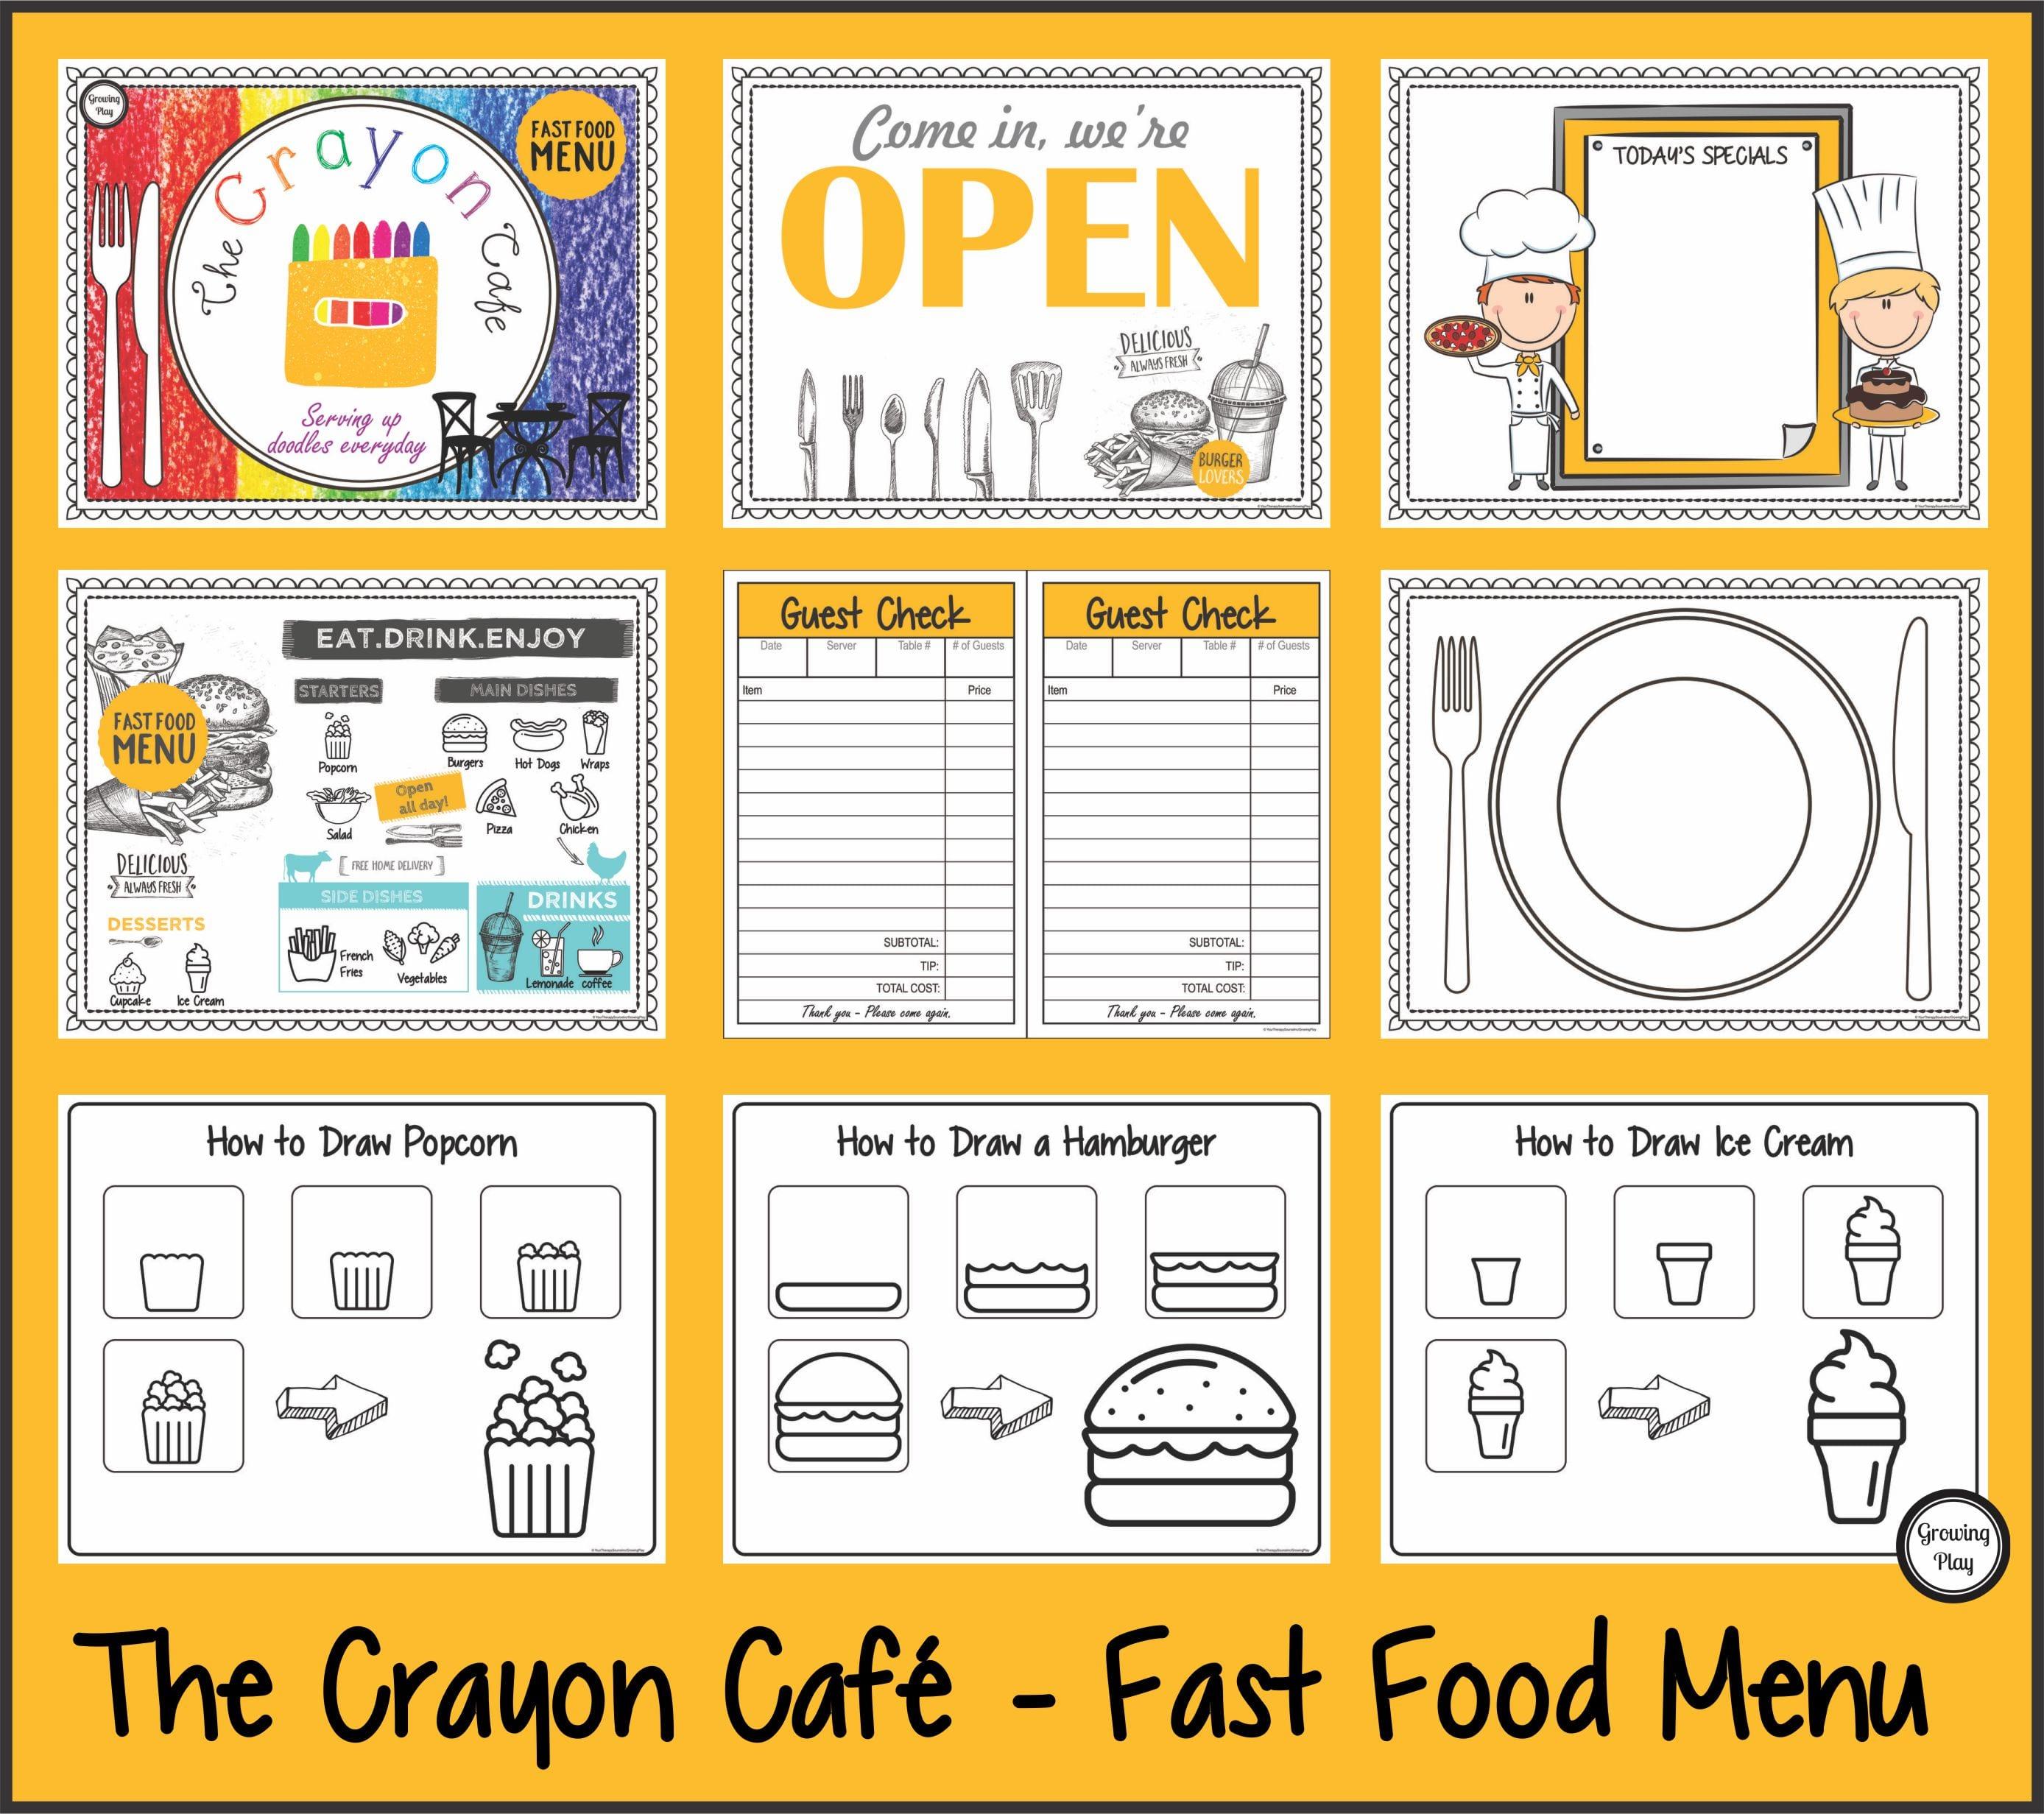 The Crayon Cafe